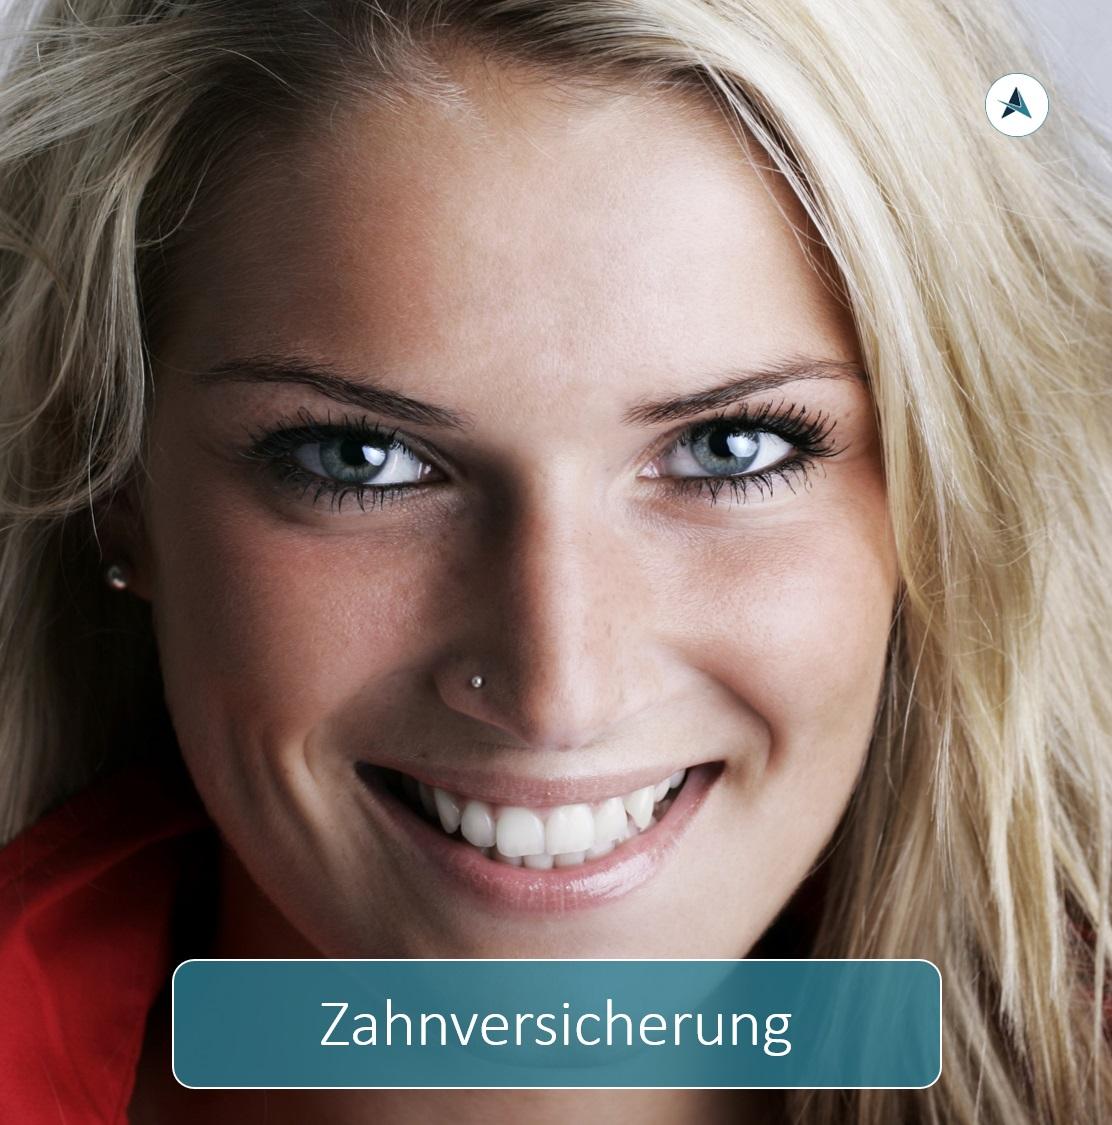 Kaulsdorf-Versicherungsmakler-Berlin-Zahnversicherung-Zahnzusatzversicherung-André-Böttcher-12621